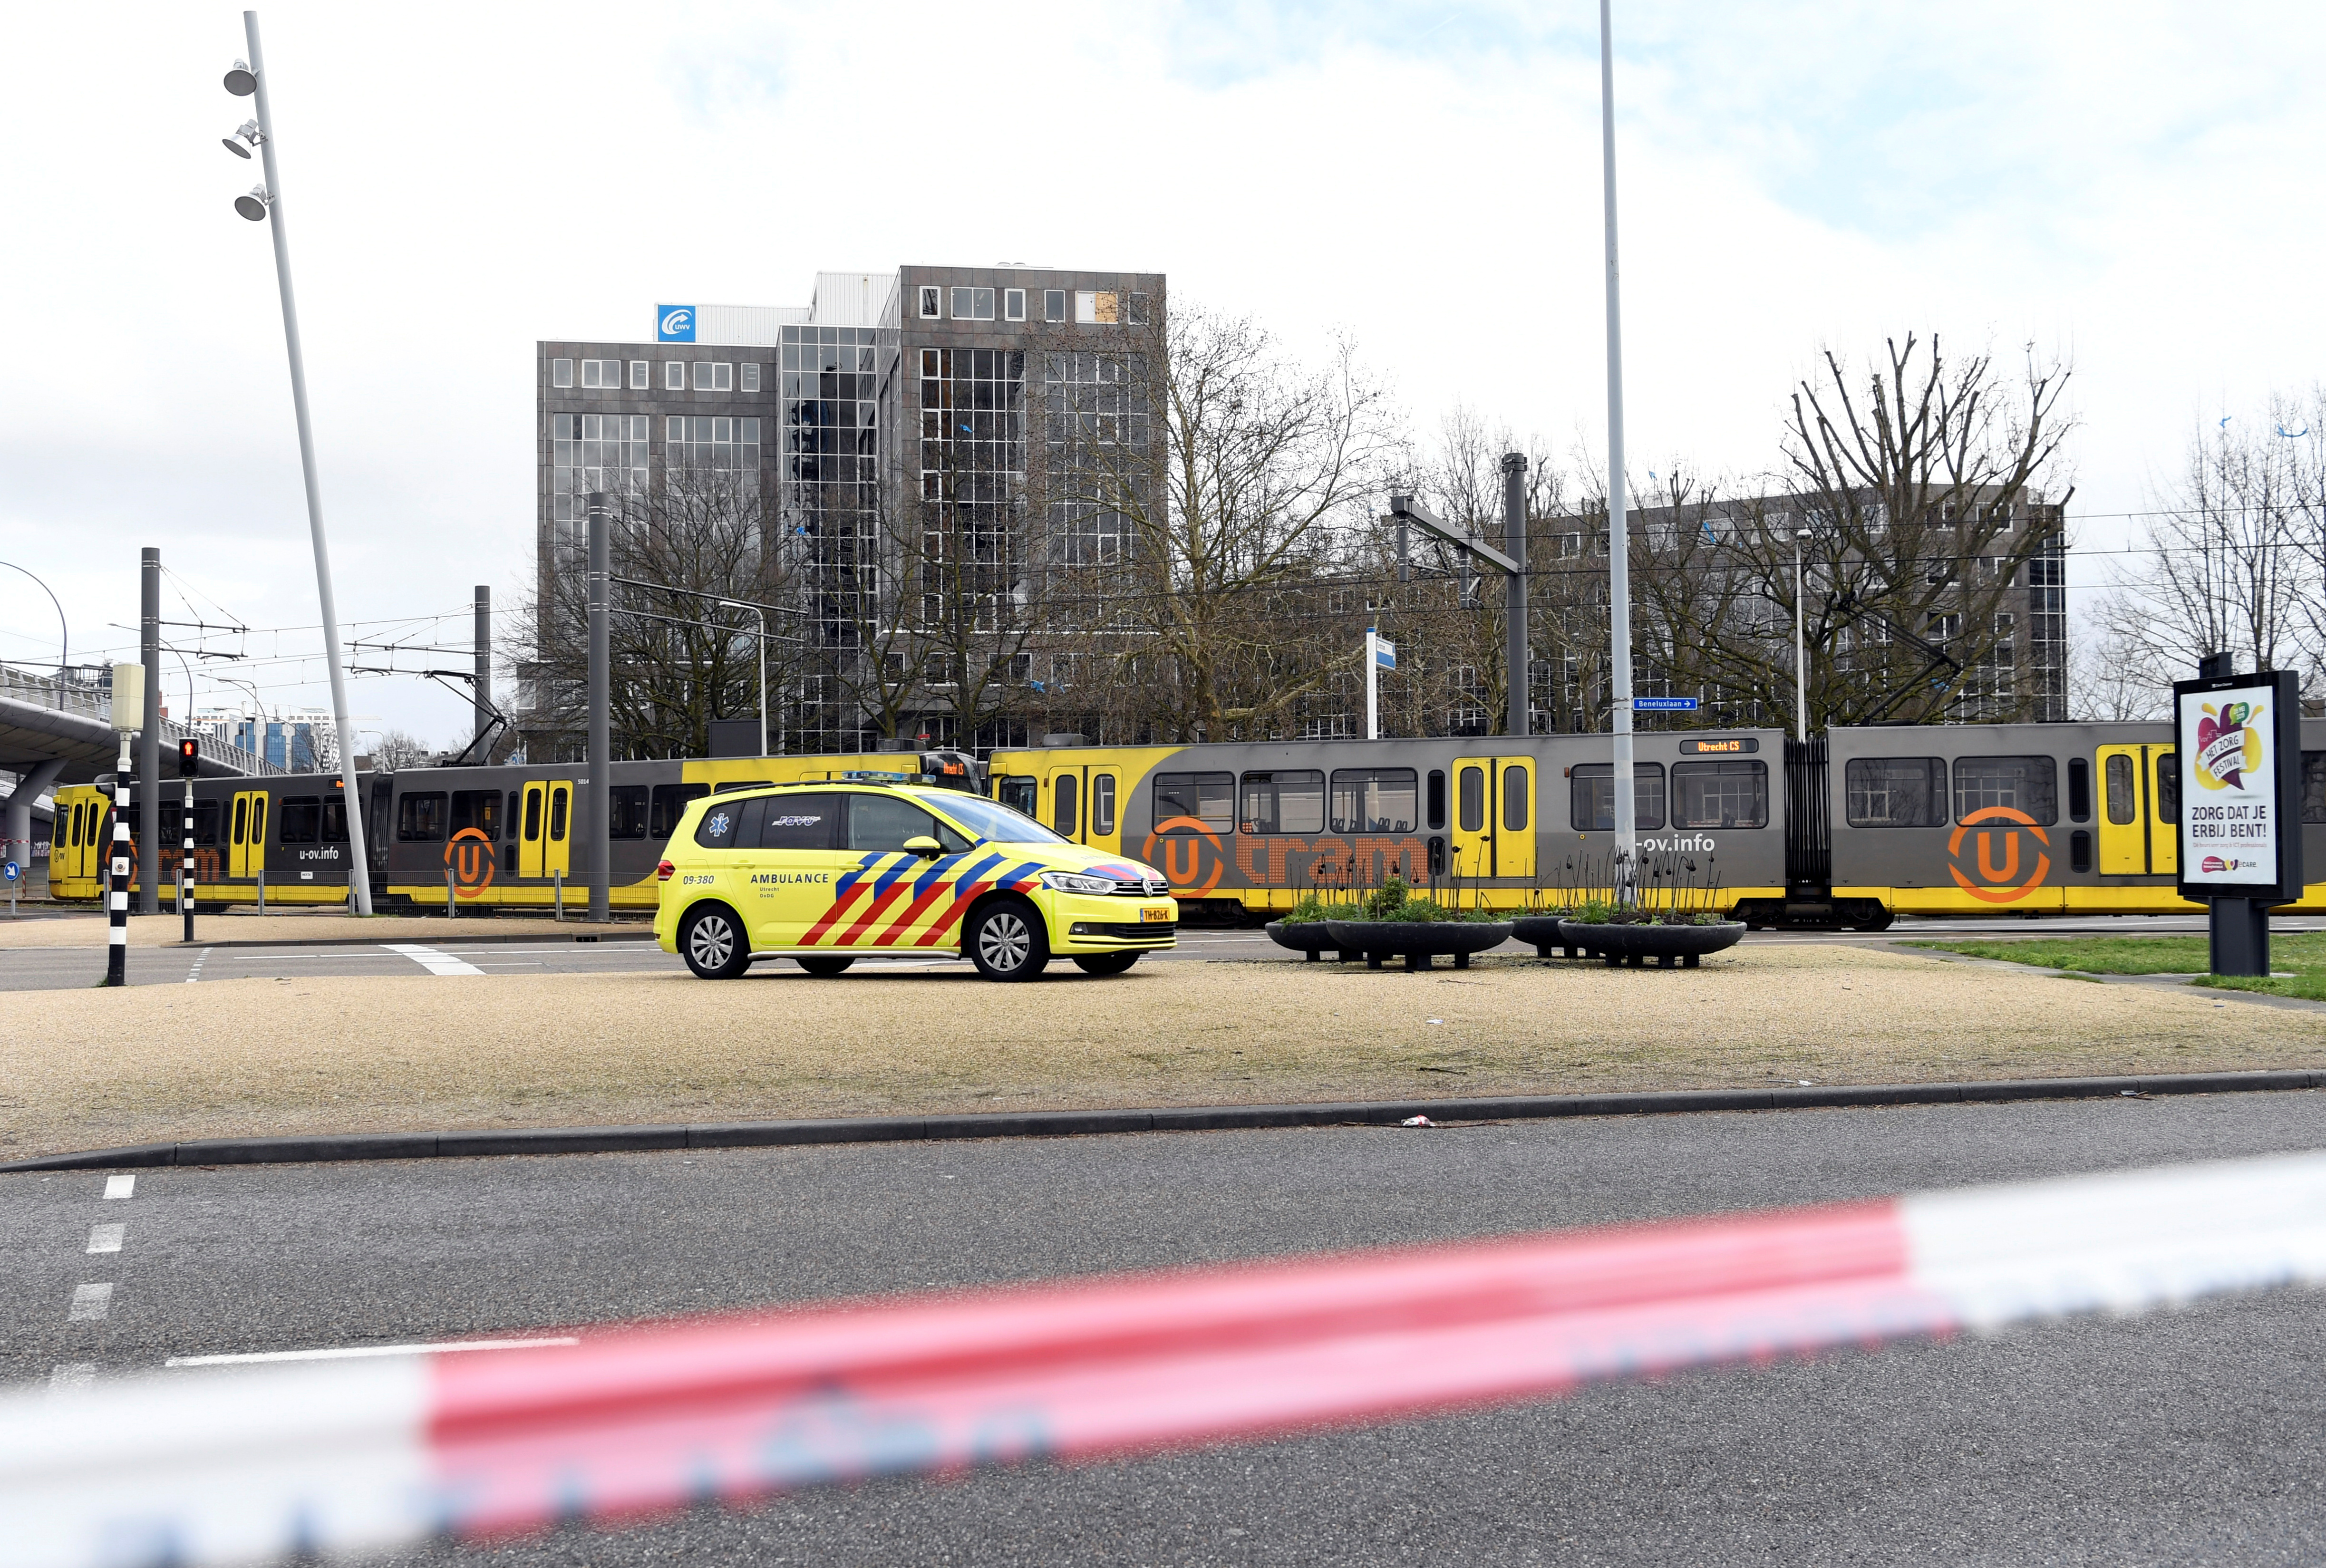 A view of the site of a shooting in Utrecht, Netherlands, March 18, 2019. REUTERS/Piroschka van de Wouw